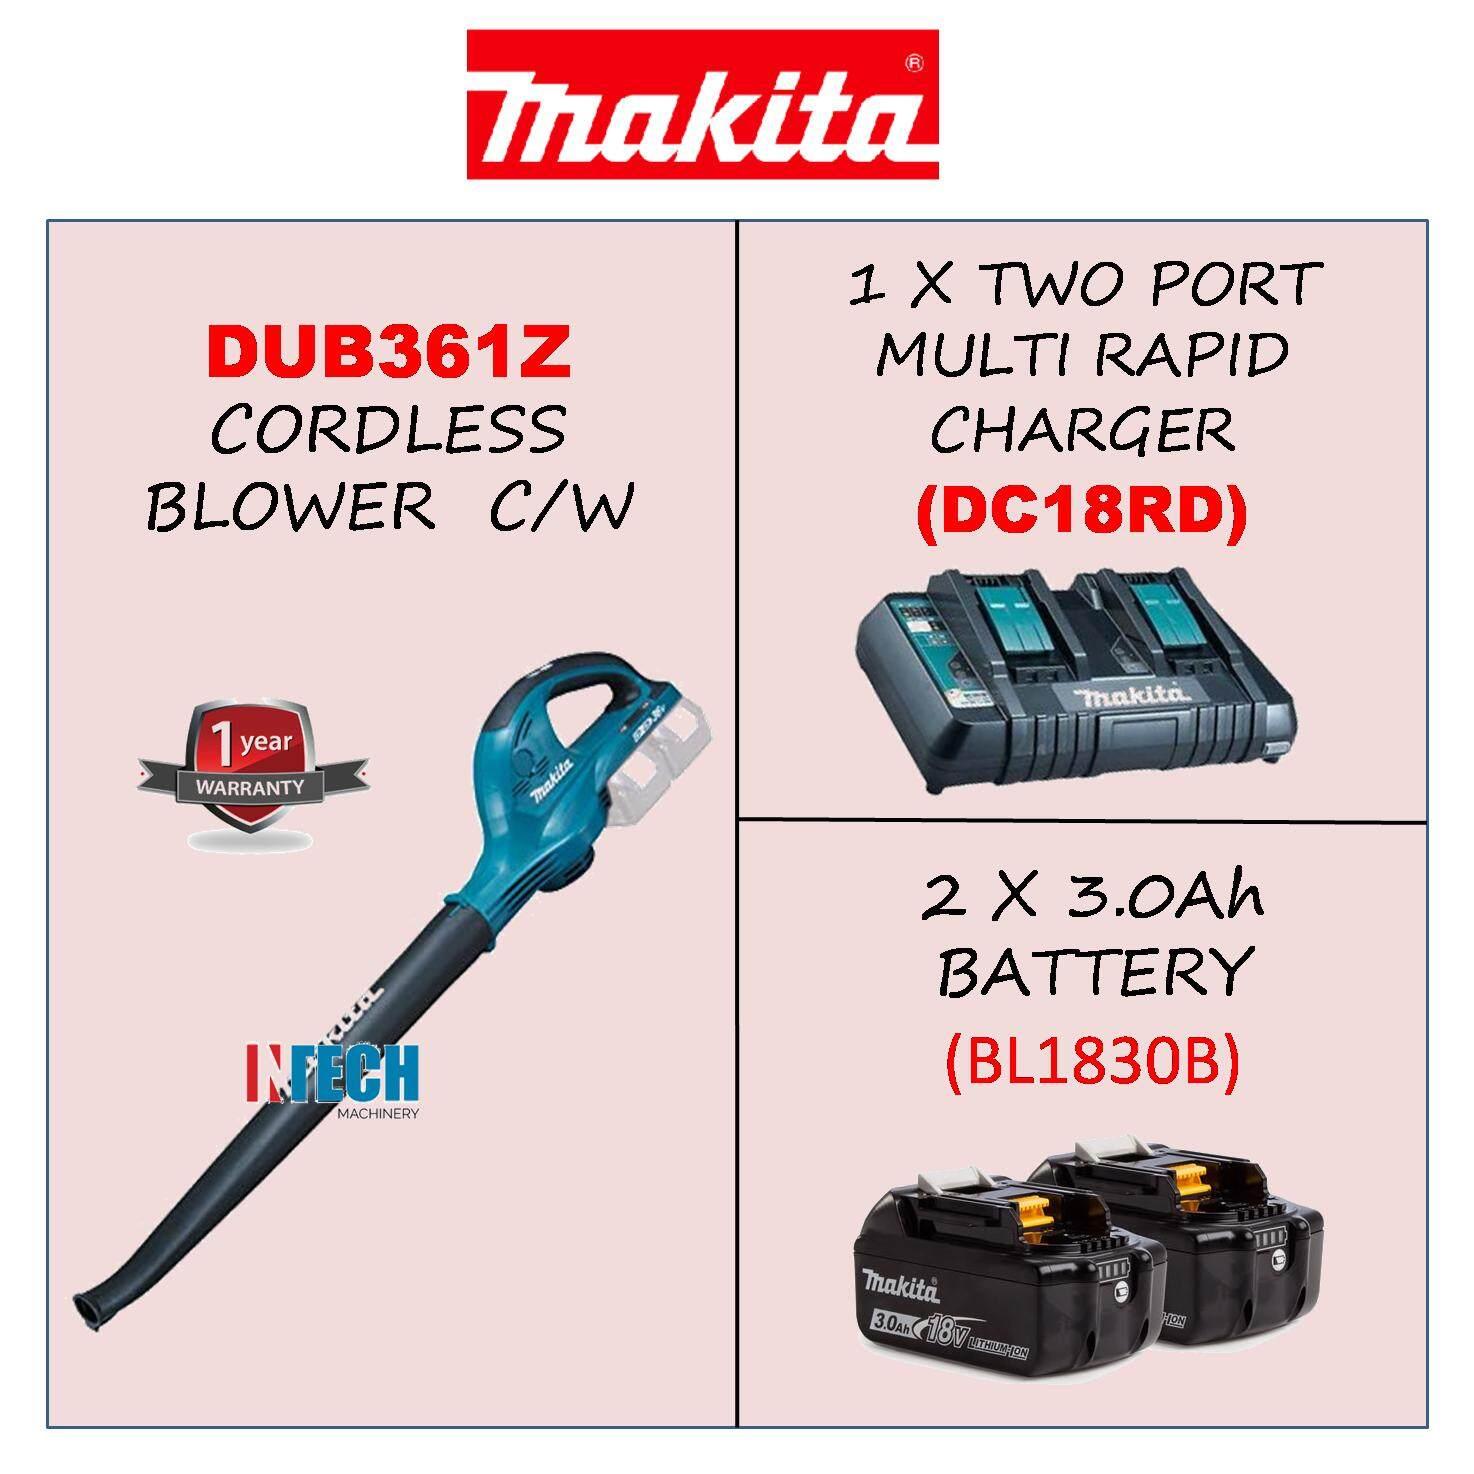 MAKITA DUB361Z CORDLESS BLOWER C/W 2 X 3.0Ah BATTERY, 1 X TWO PORT MULTI RAPID CHARGER